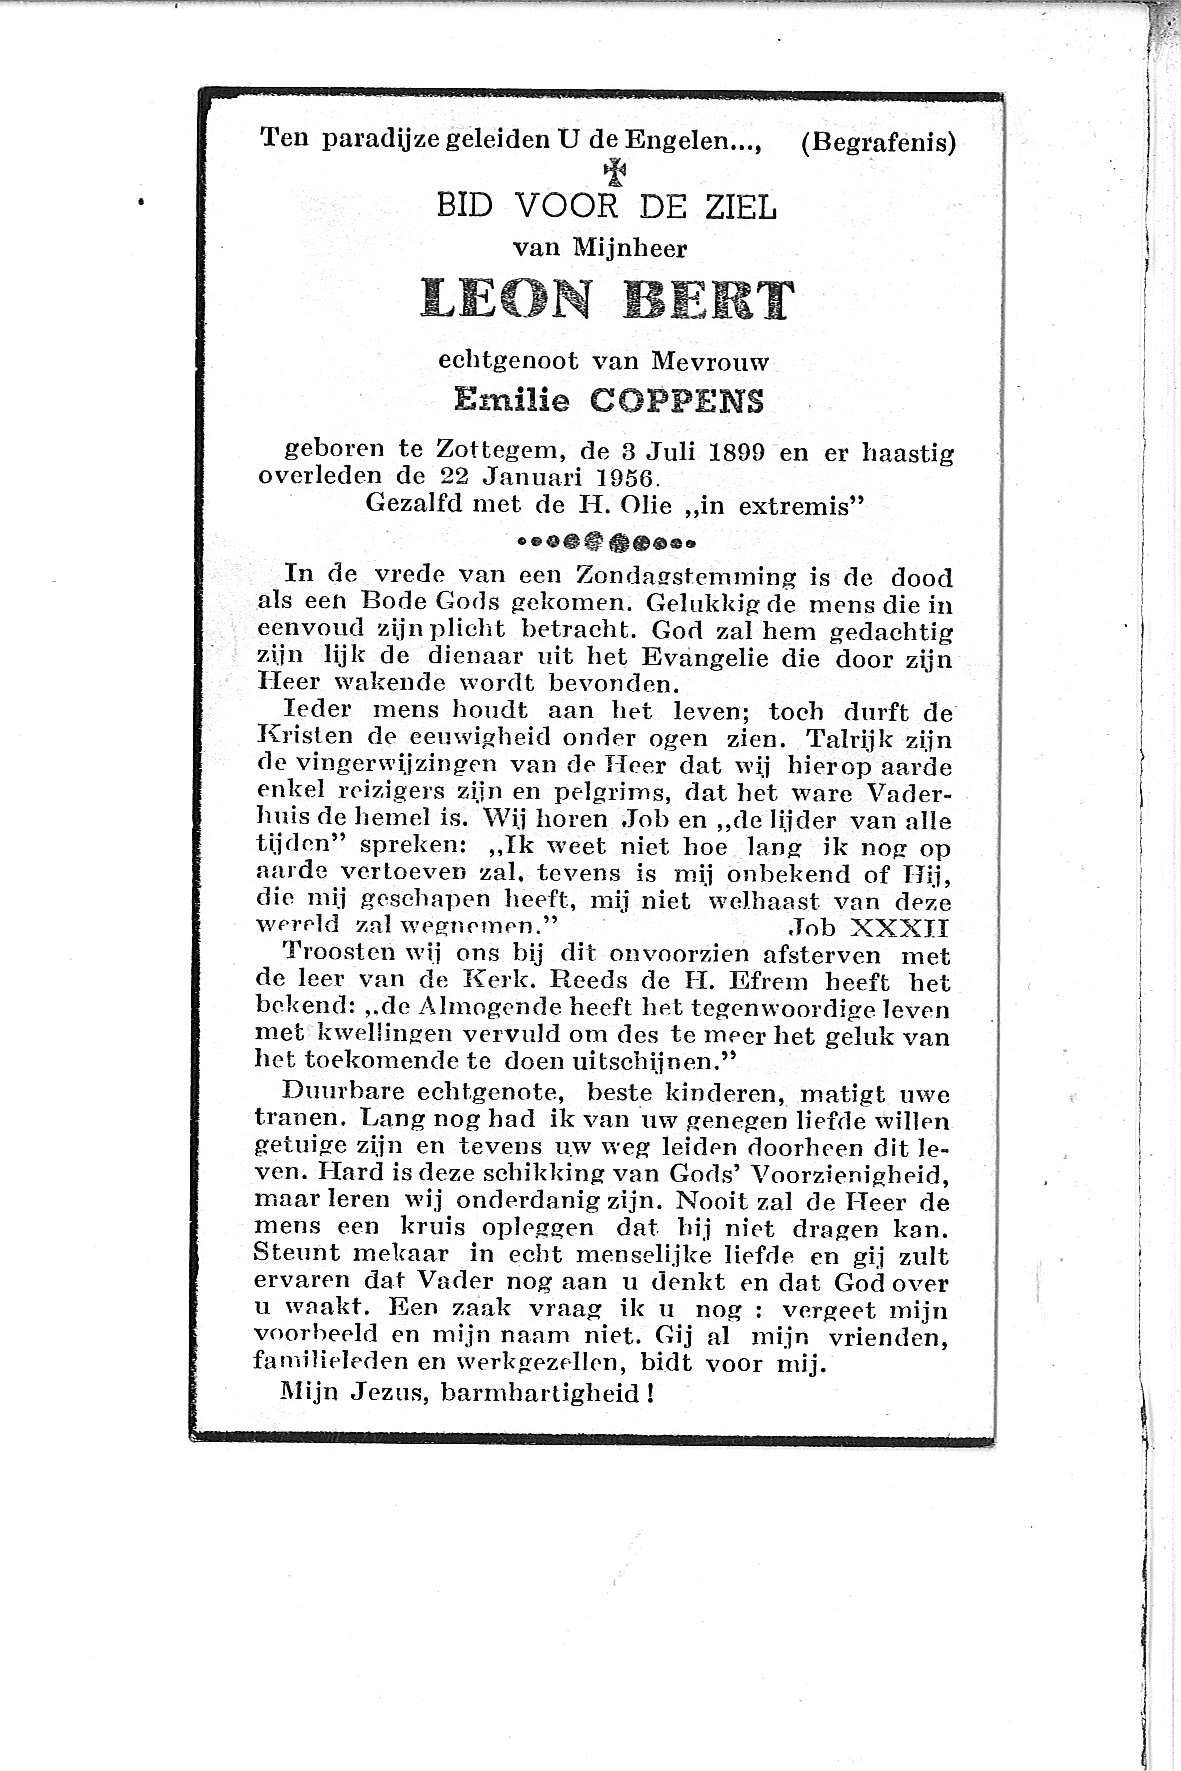 Leon(1956)20110131111640_00005.jpg